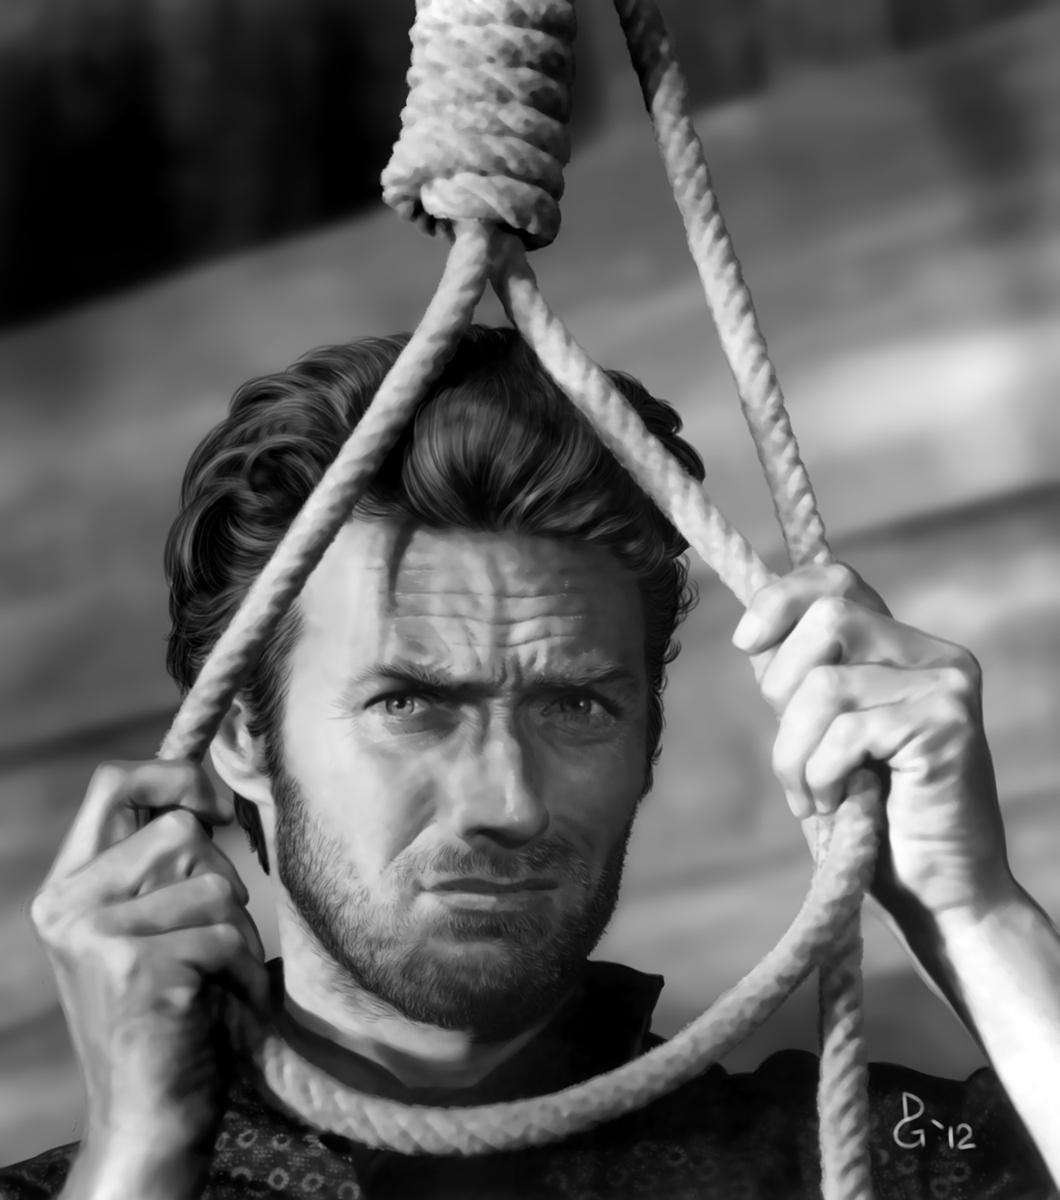 Clint Eastwood By Haydn104 On DeviantArt